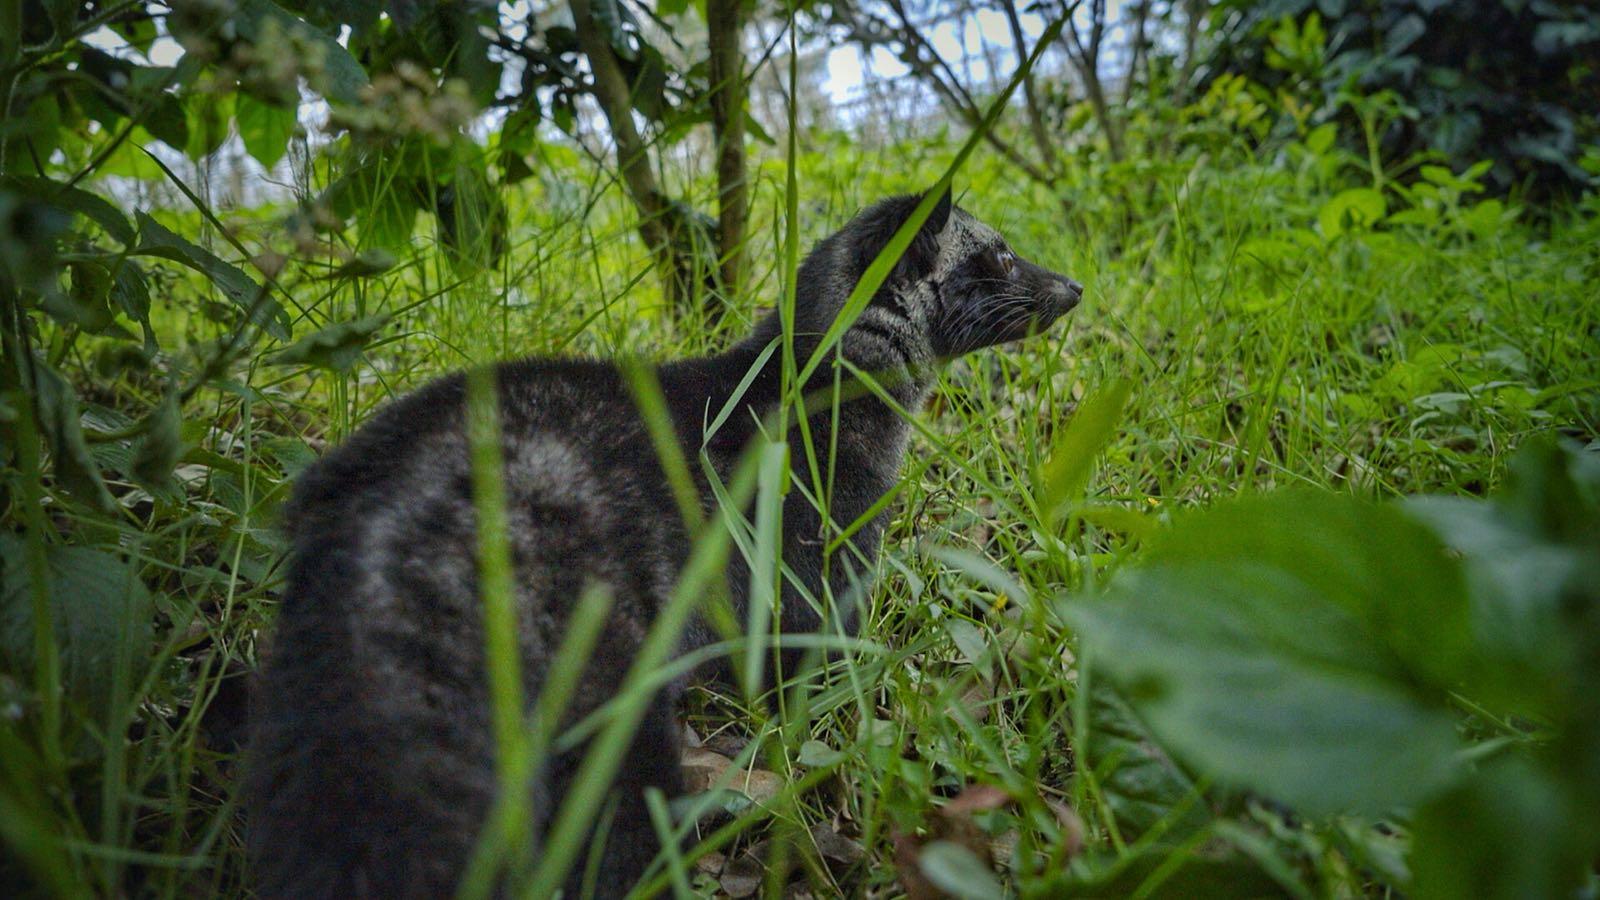 luwak in grass.jpeg